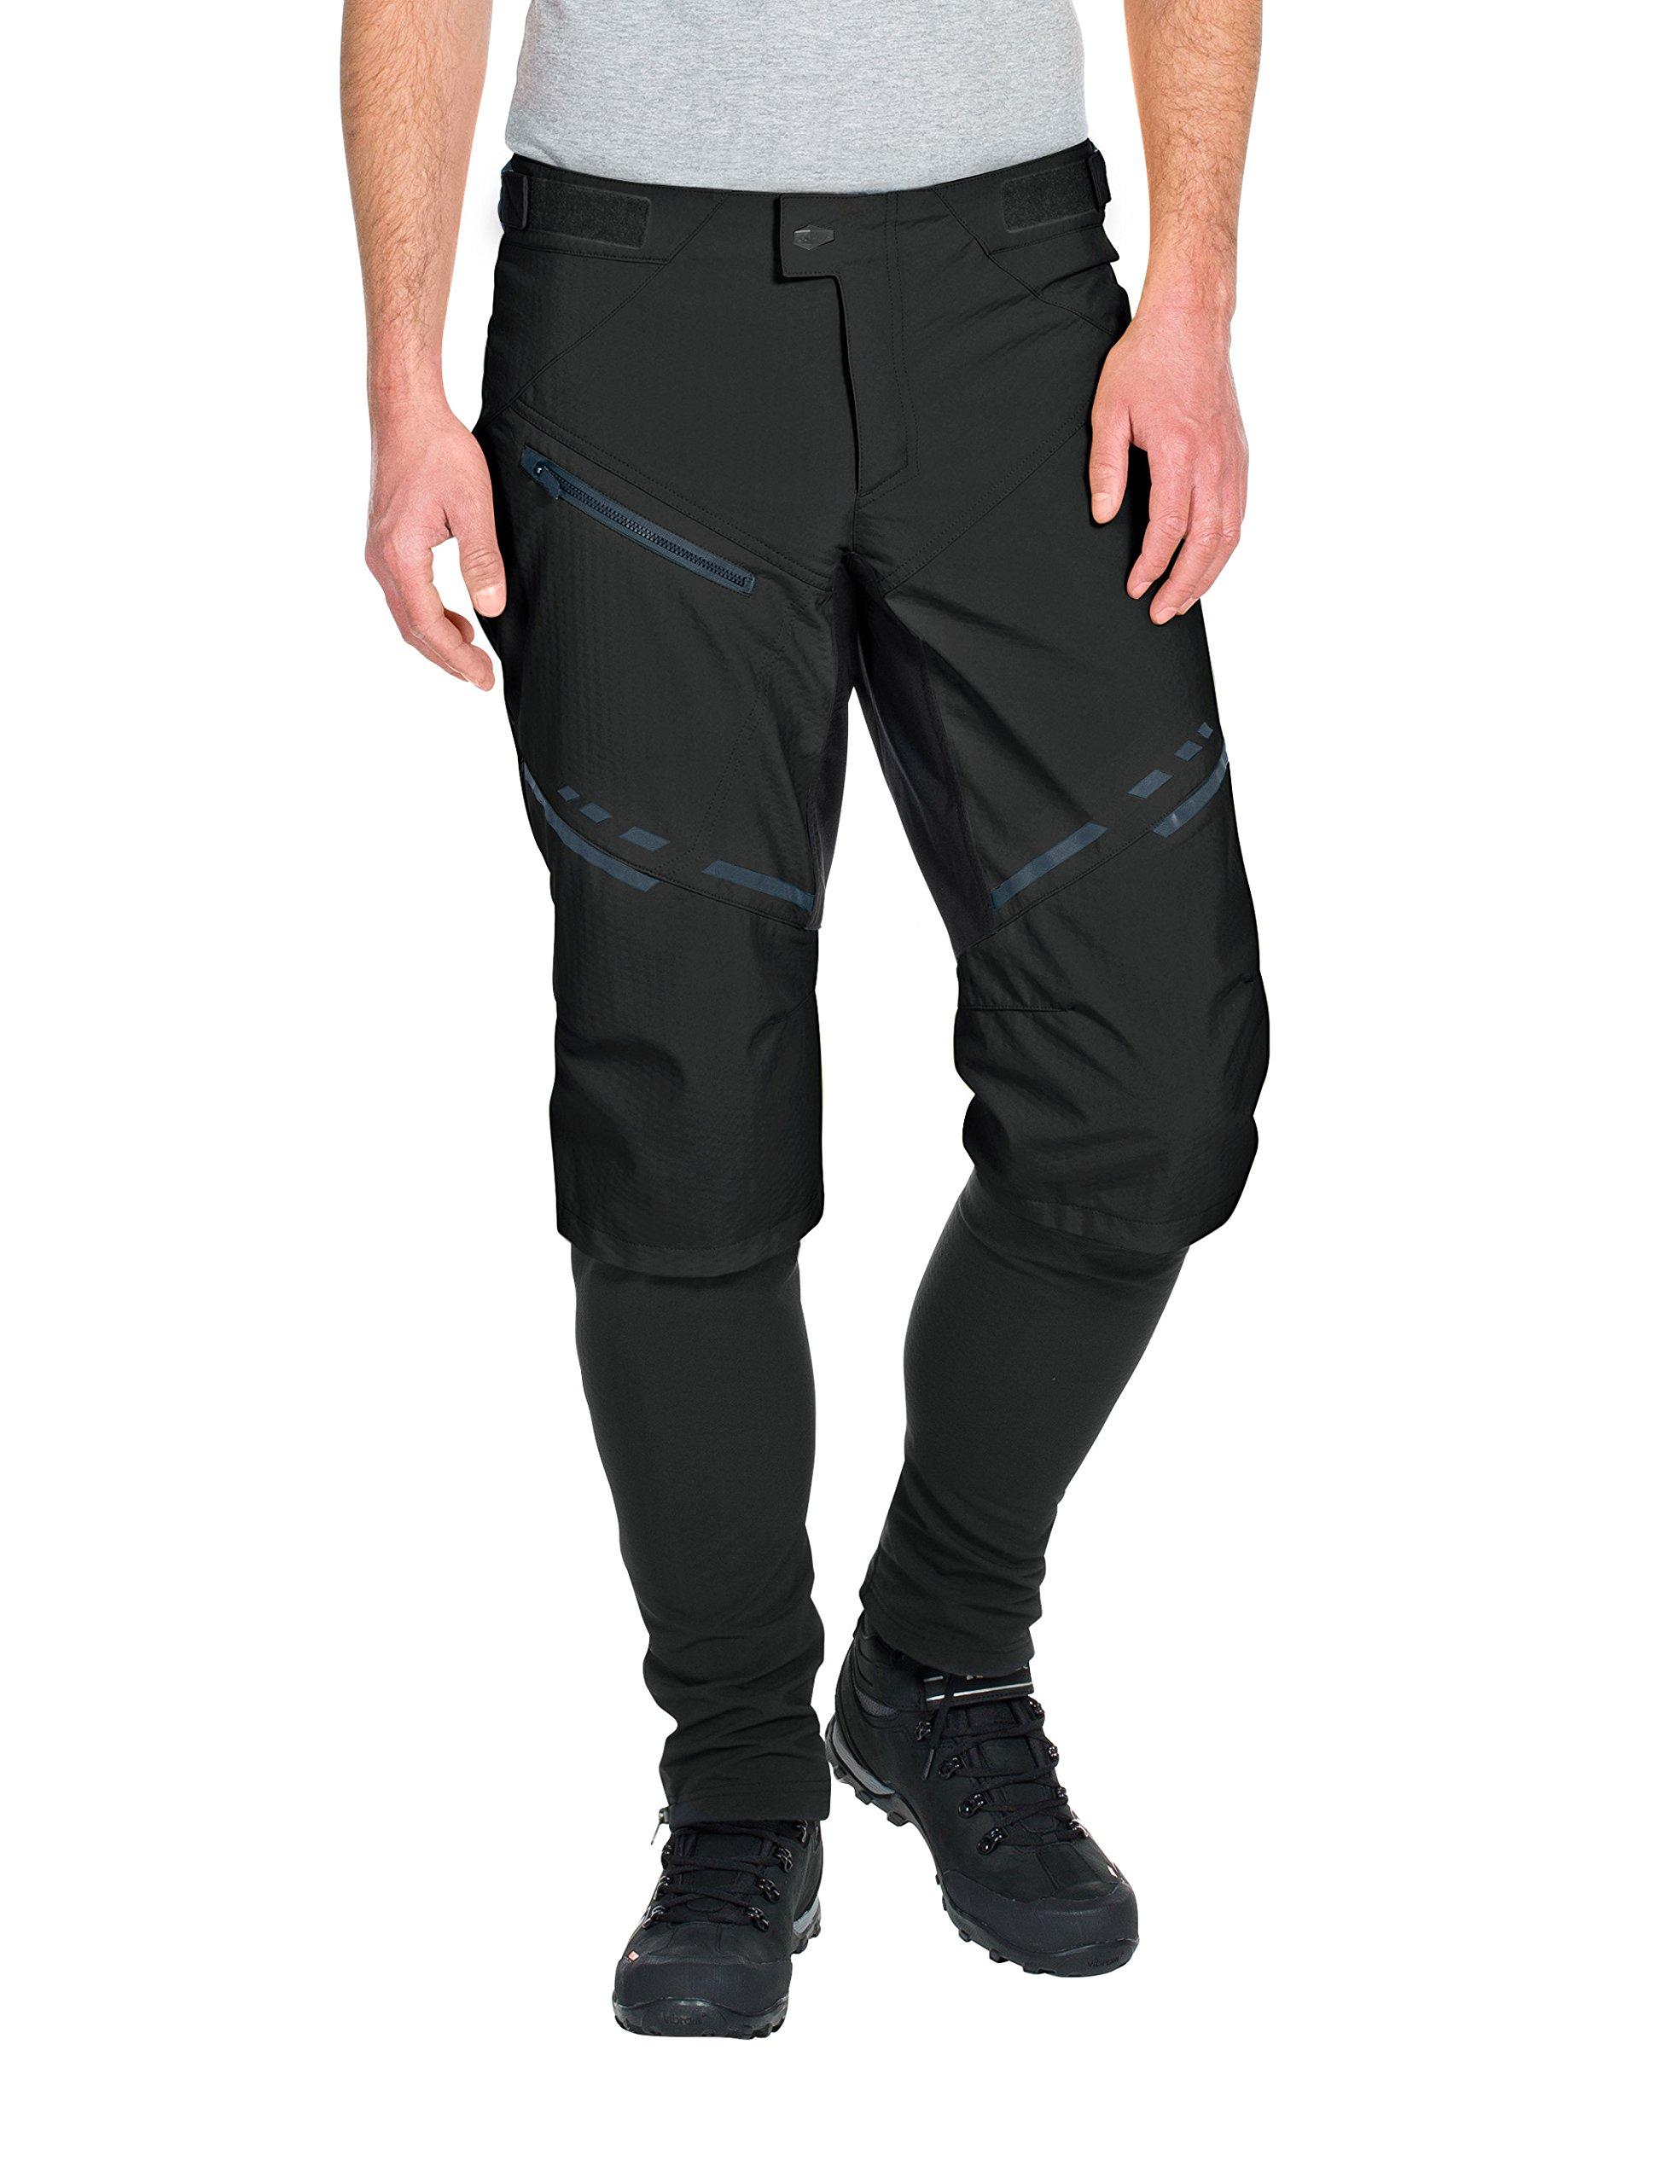 VAUDE Men's Virt Softshell Pants II, Black, Small